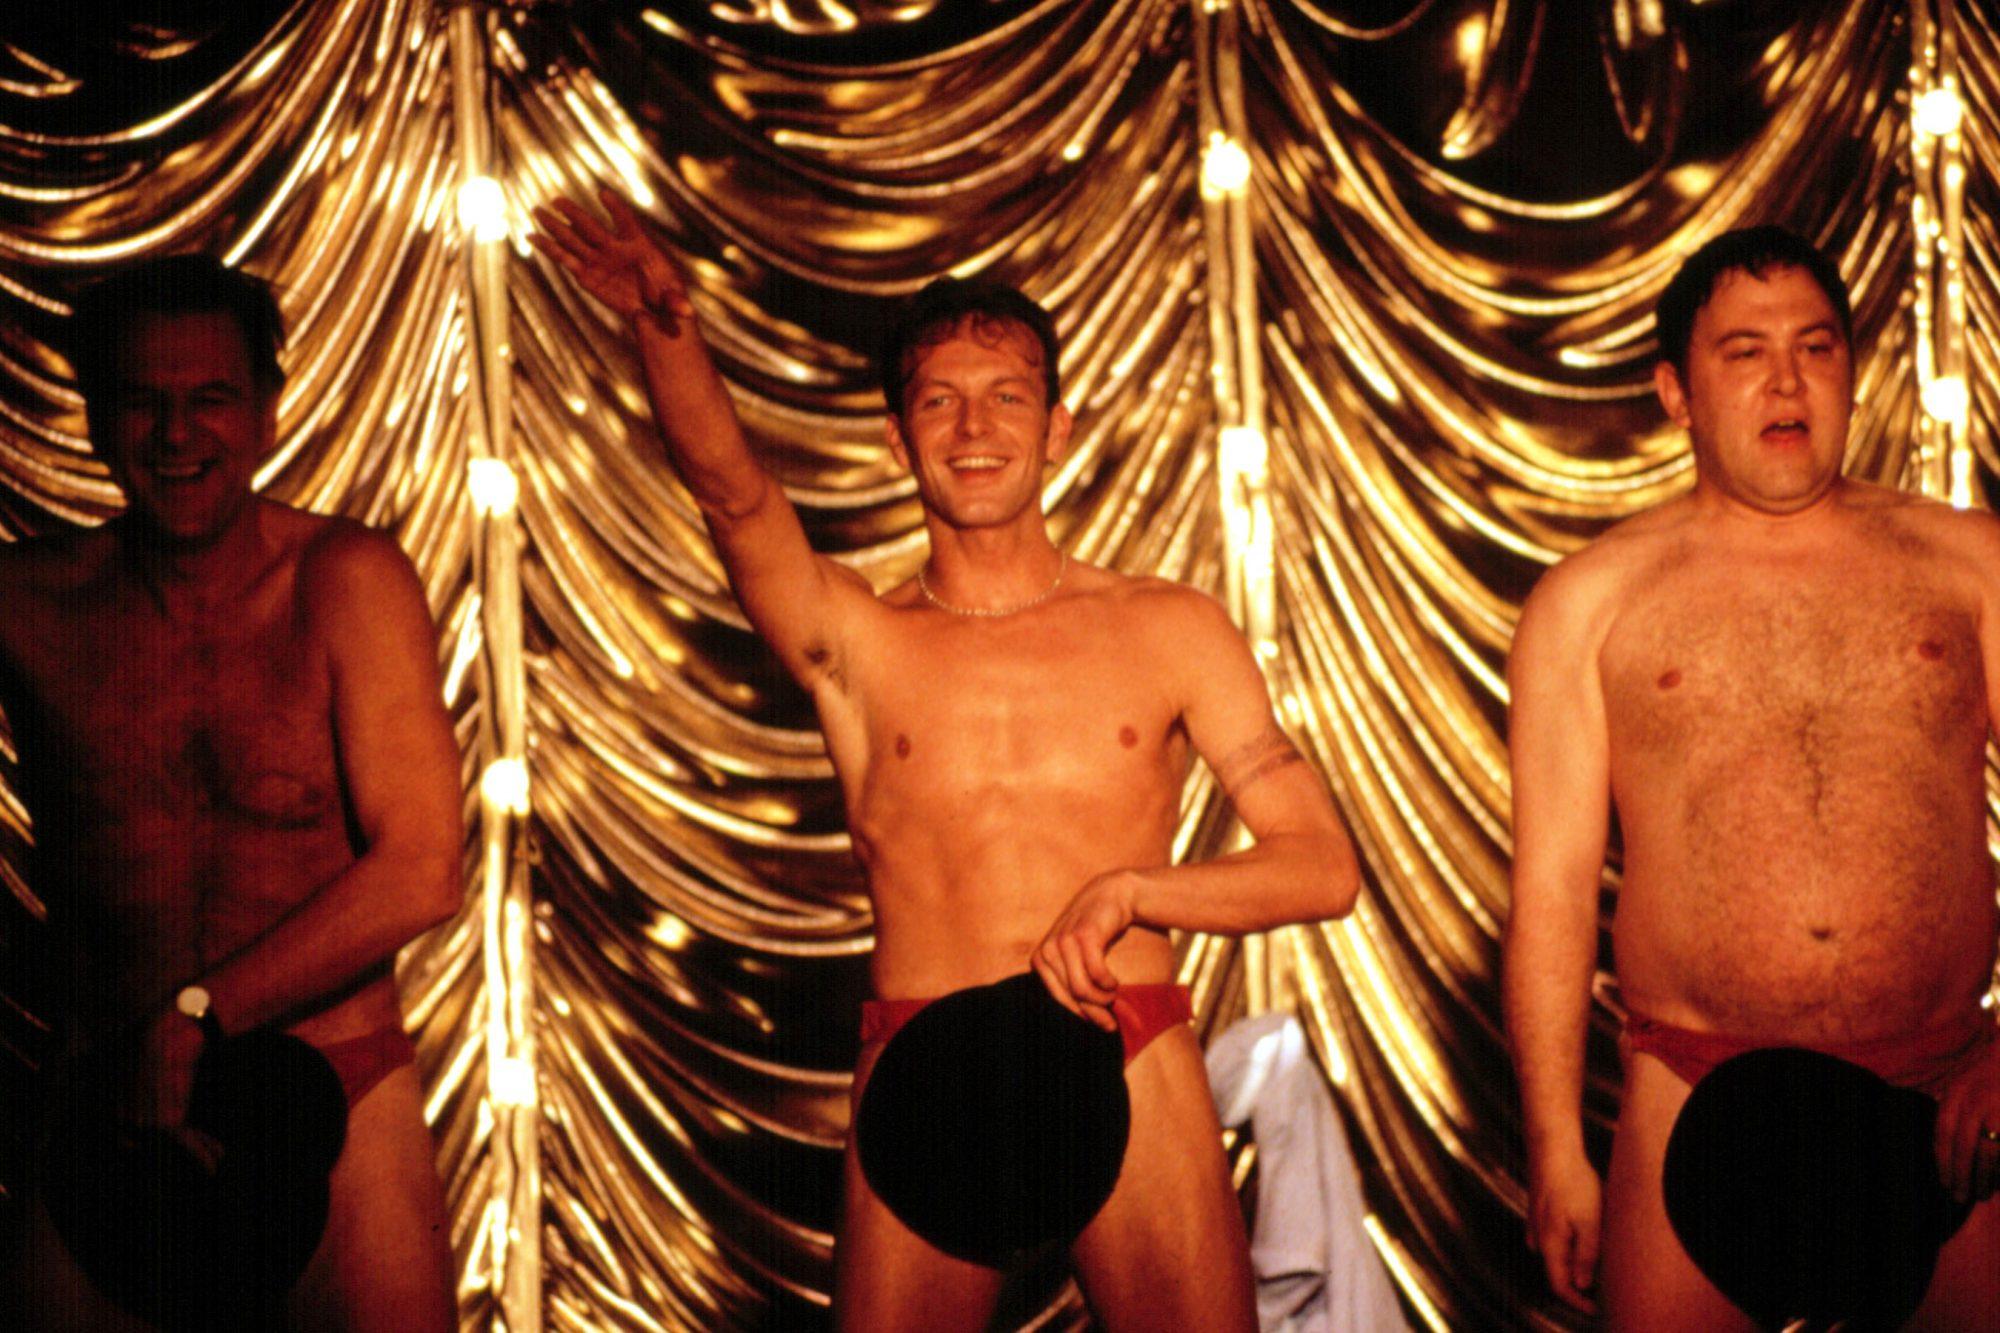 FULL MONTY, Steve Huison, Mark Addy, 1997, TM & Copyright (c) 20th Century Fox Film Corp. All rights